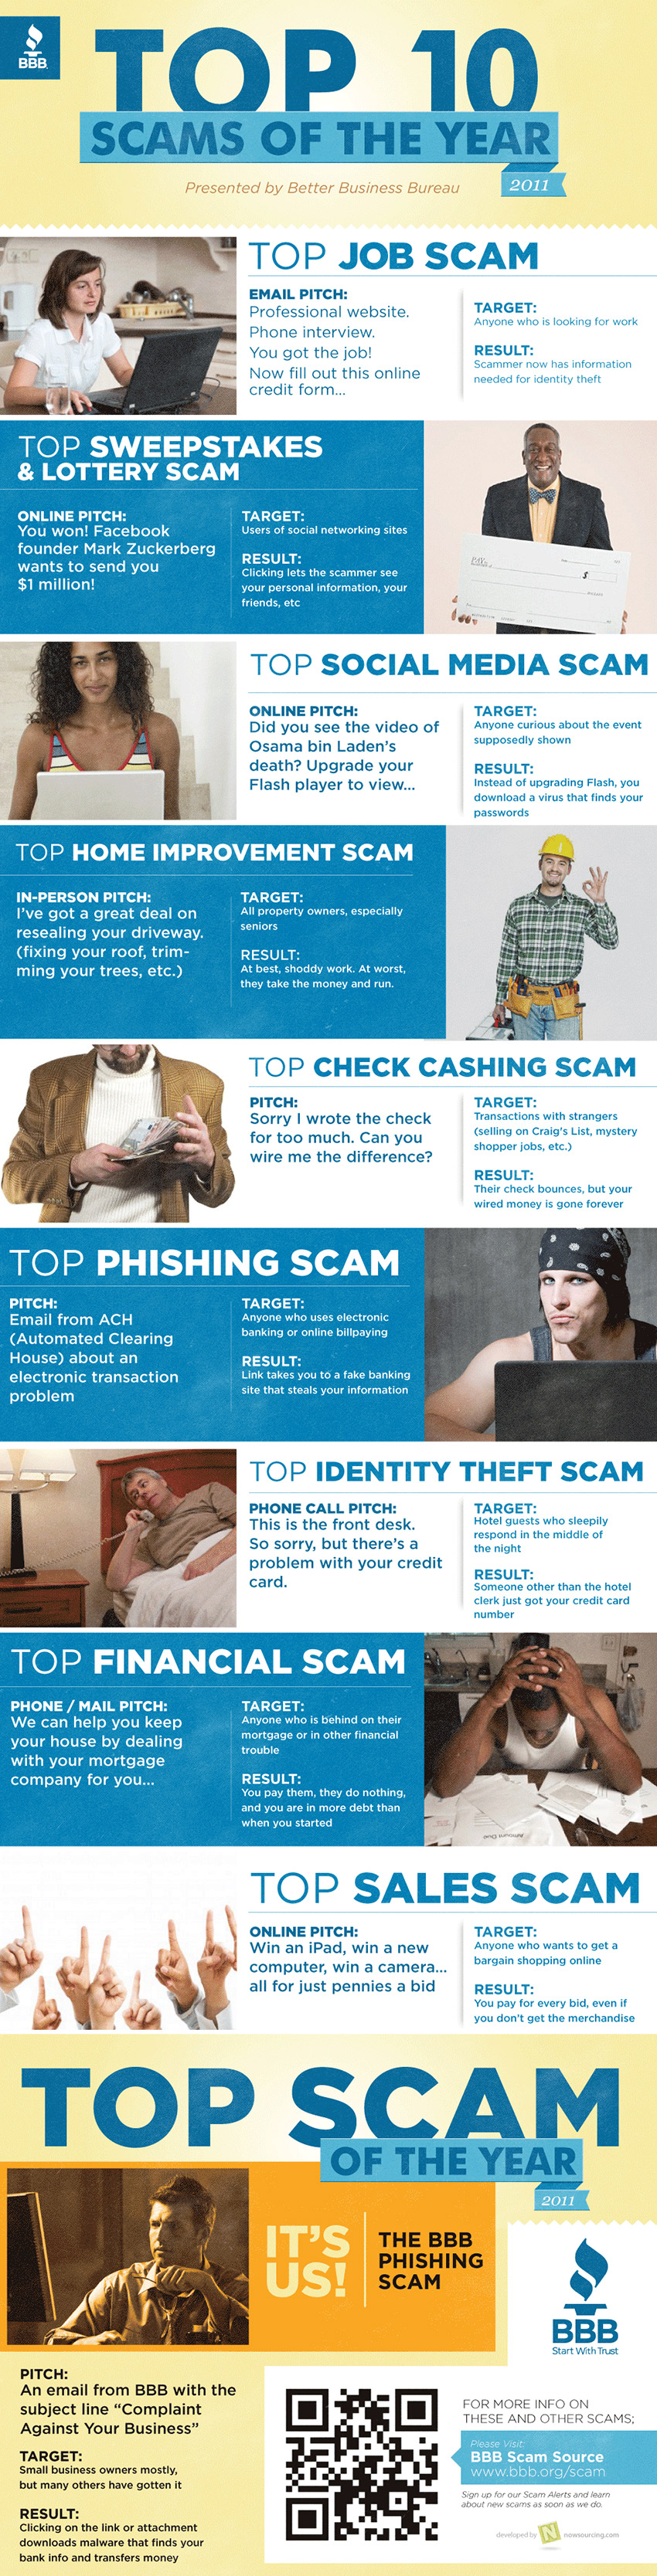 10 fraudes online en 2011